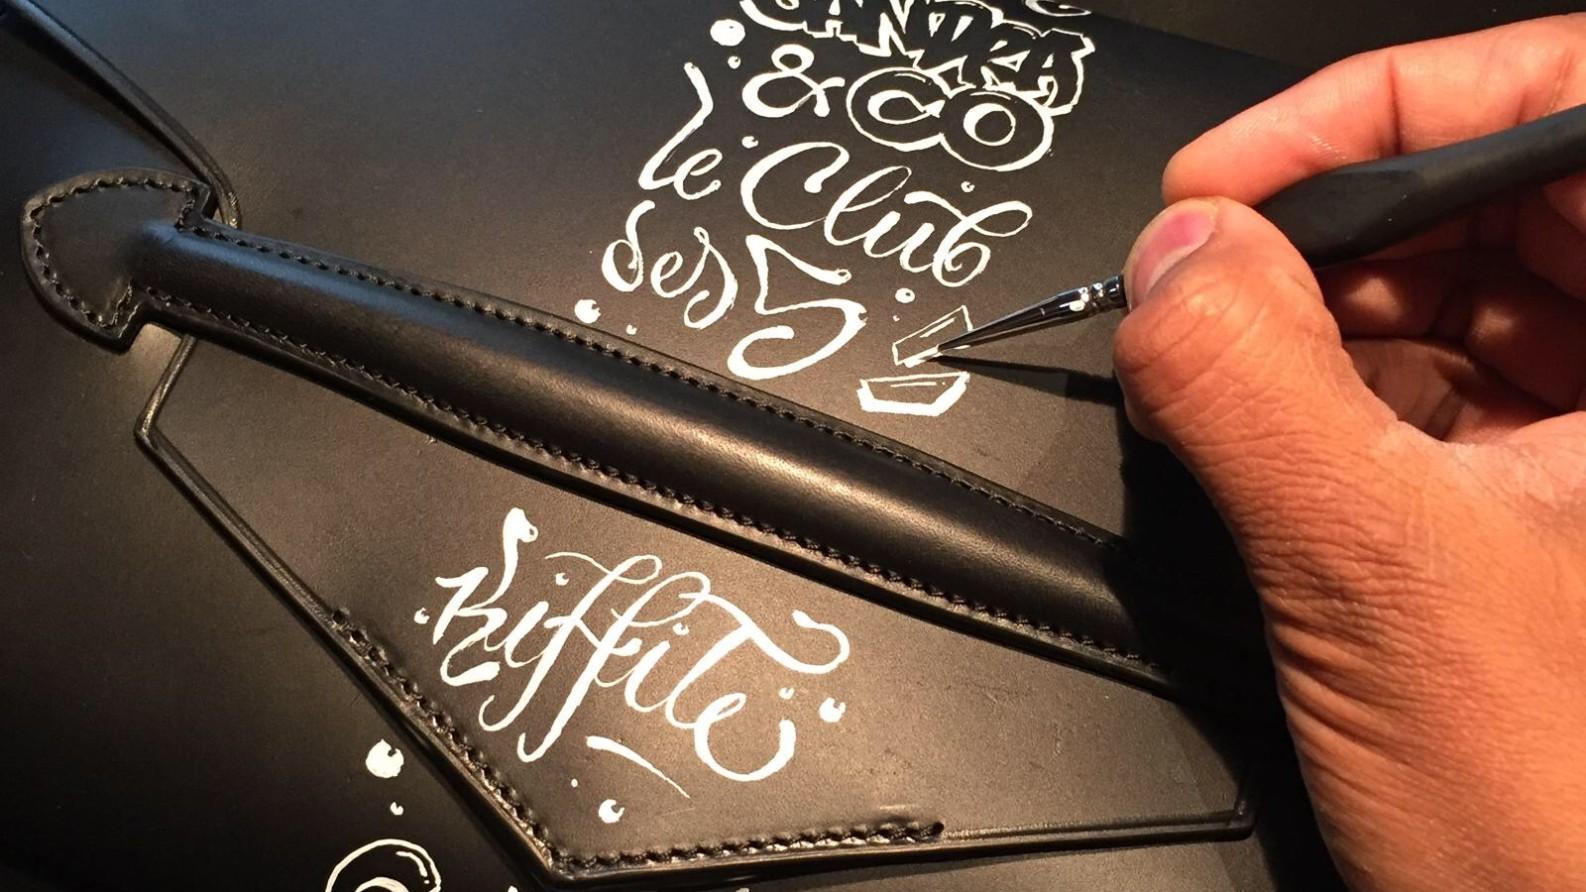 Personnalisation, Maroquinerie, paris, artisan, cuir